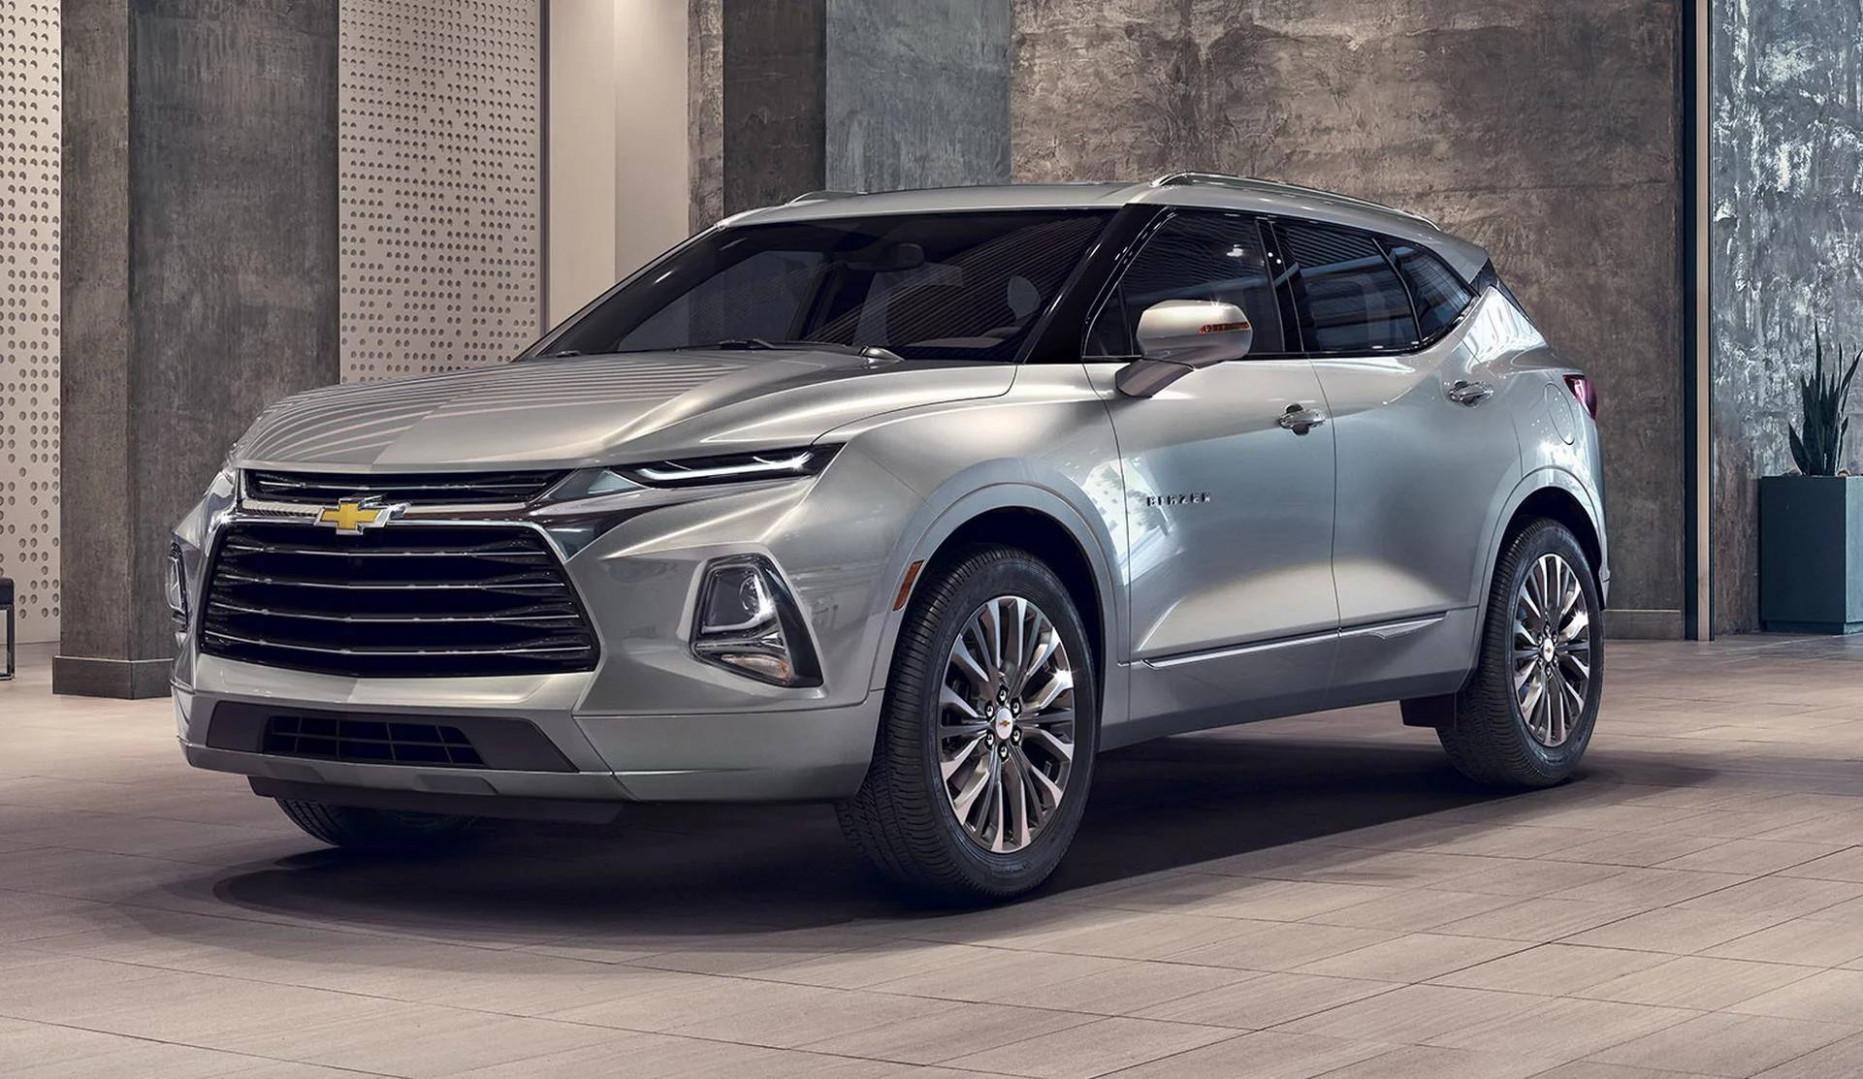 Rumors Chevrolet Blazer 2022